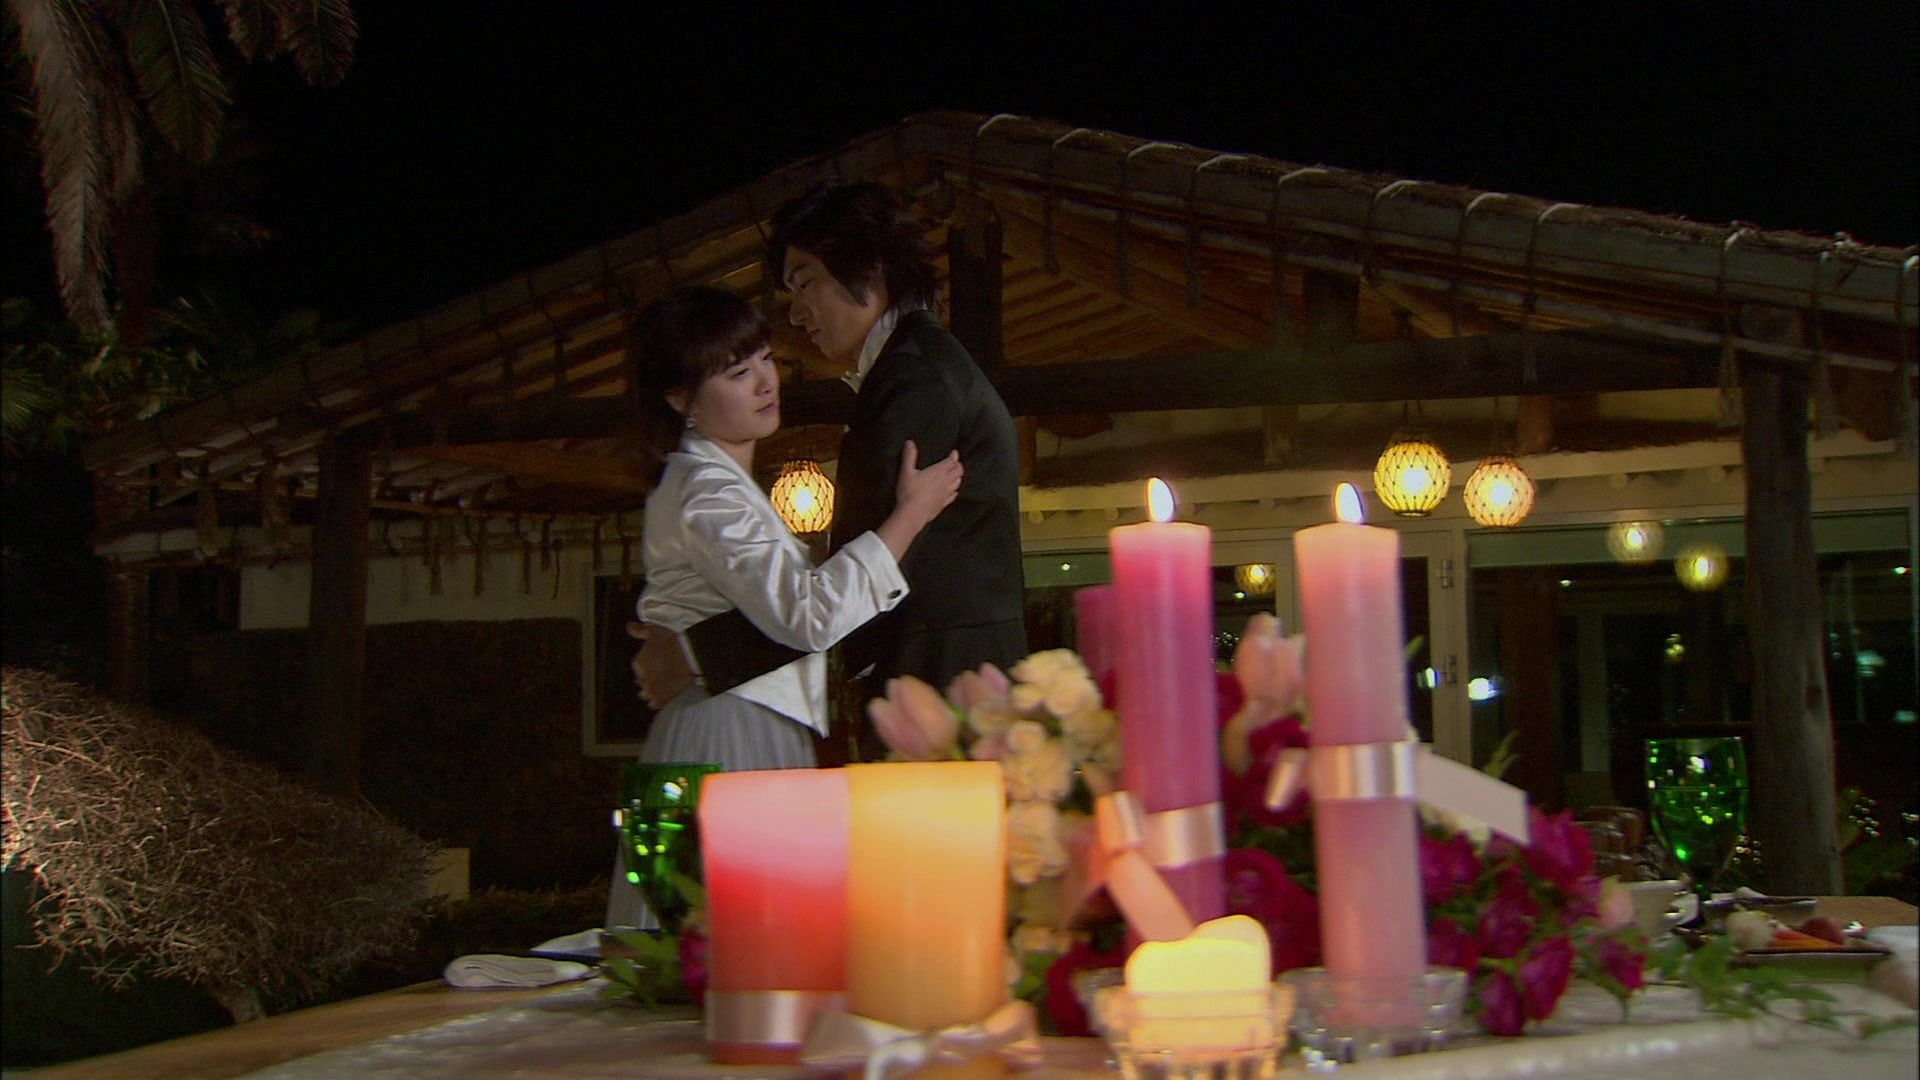 Boys over flowers tv derana - Jun Pyo Jan Di S Heart Melting Waltz Boys Over Flowers